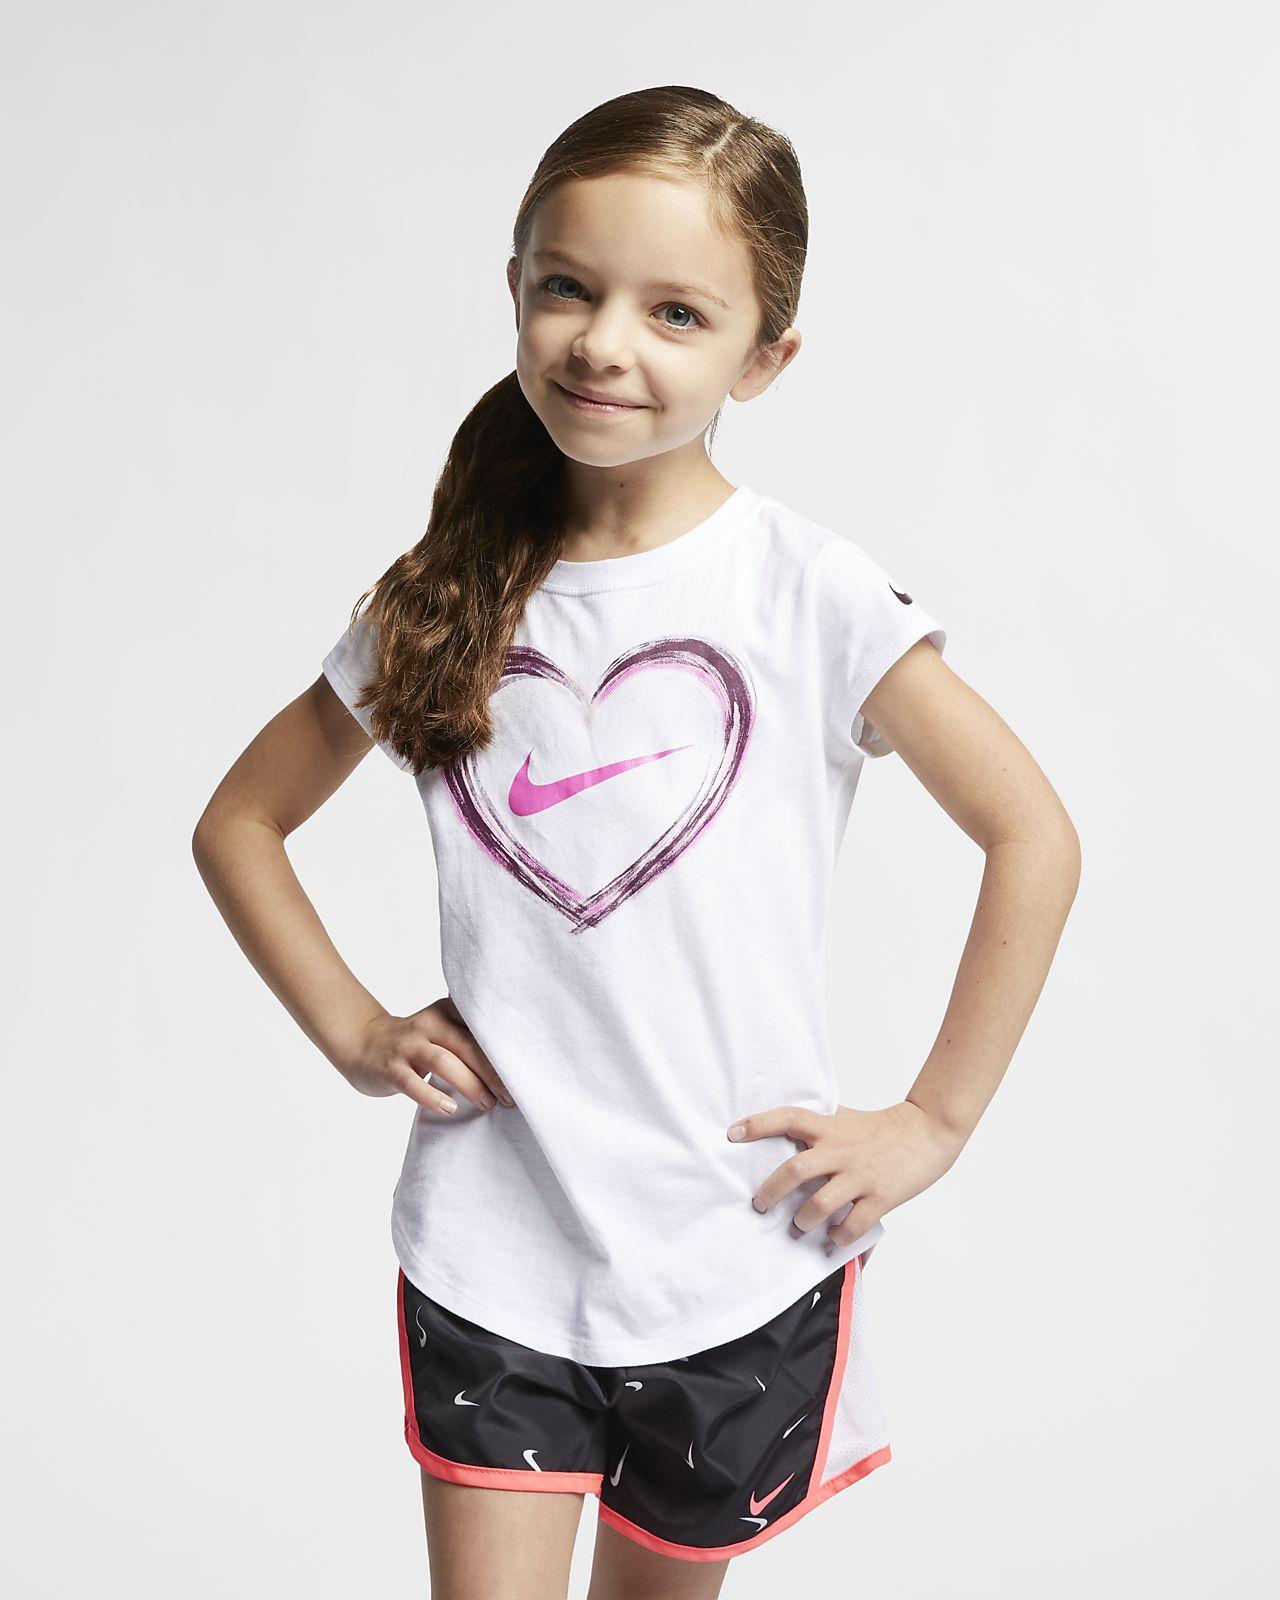 Nike-T-shirt til små børn